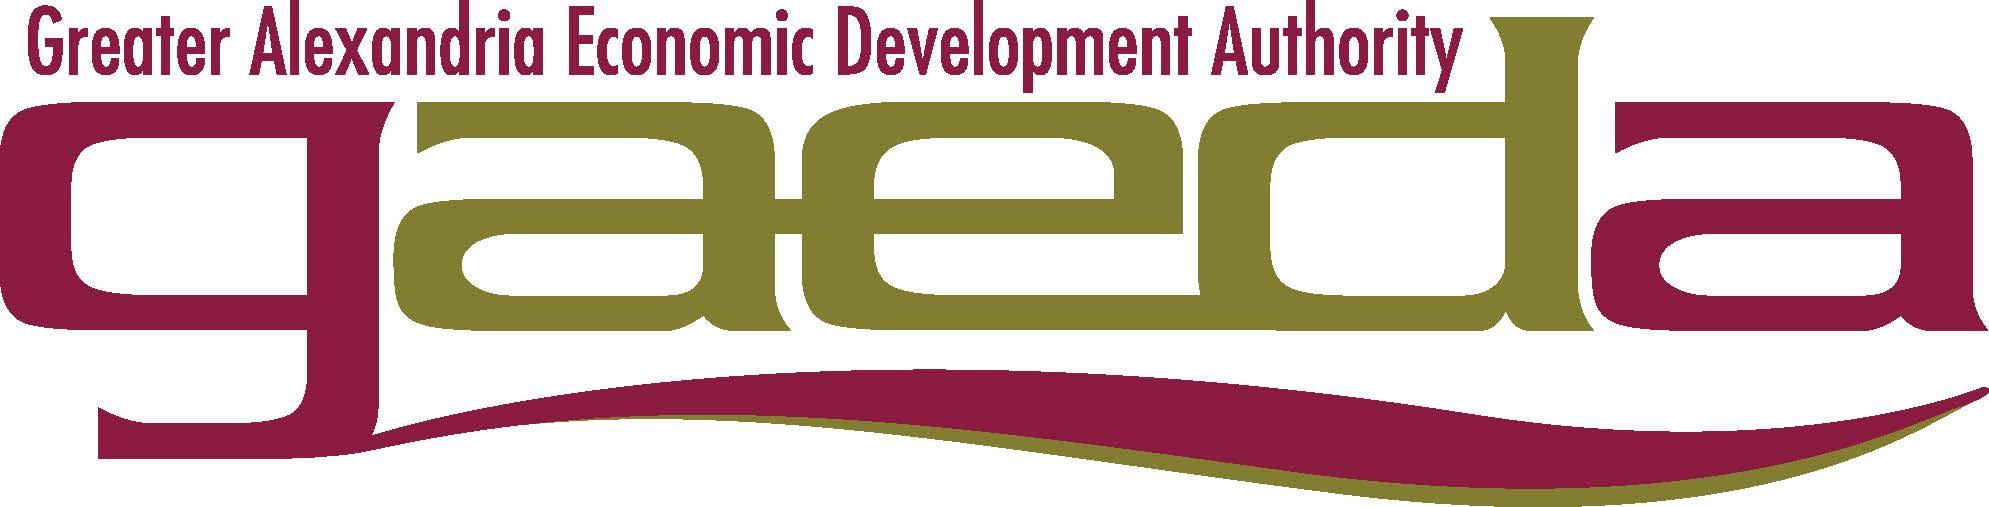 GAEDA Logo full name